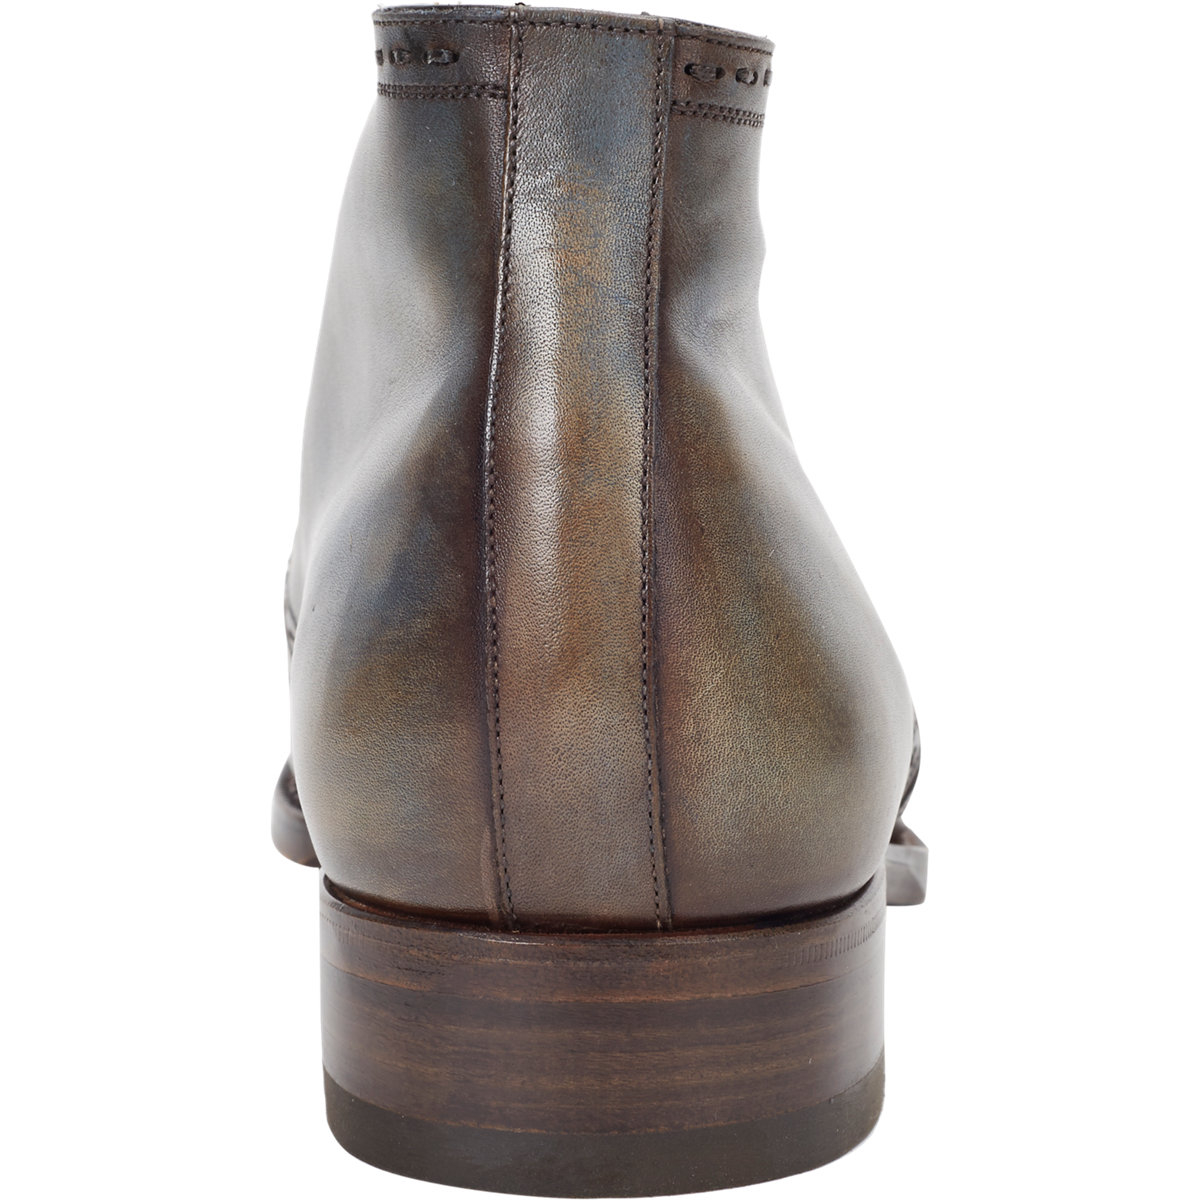 Harris Wingtip Chukka Boots in Brown for Men | Lyst